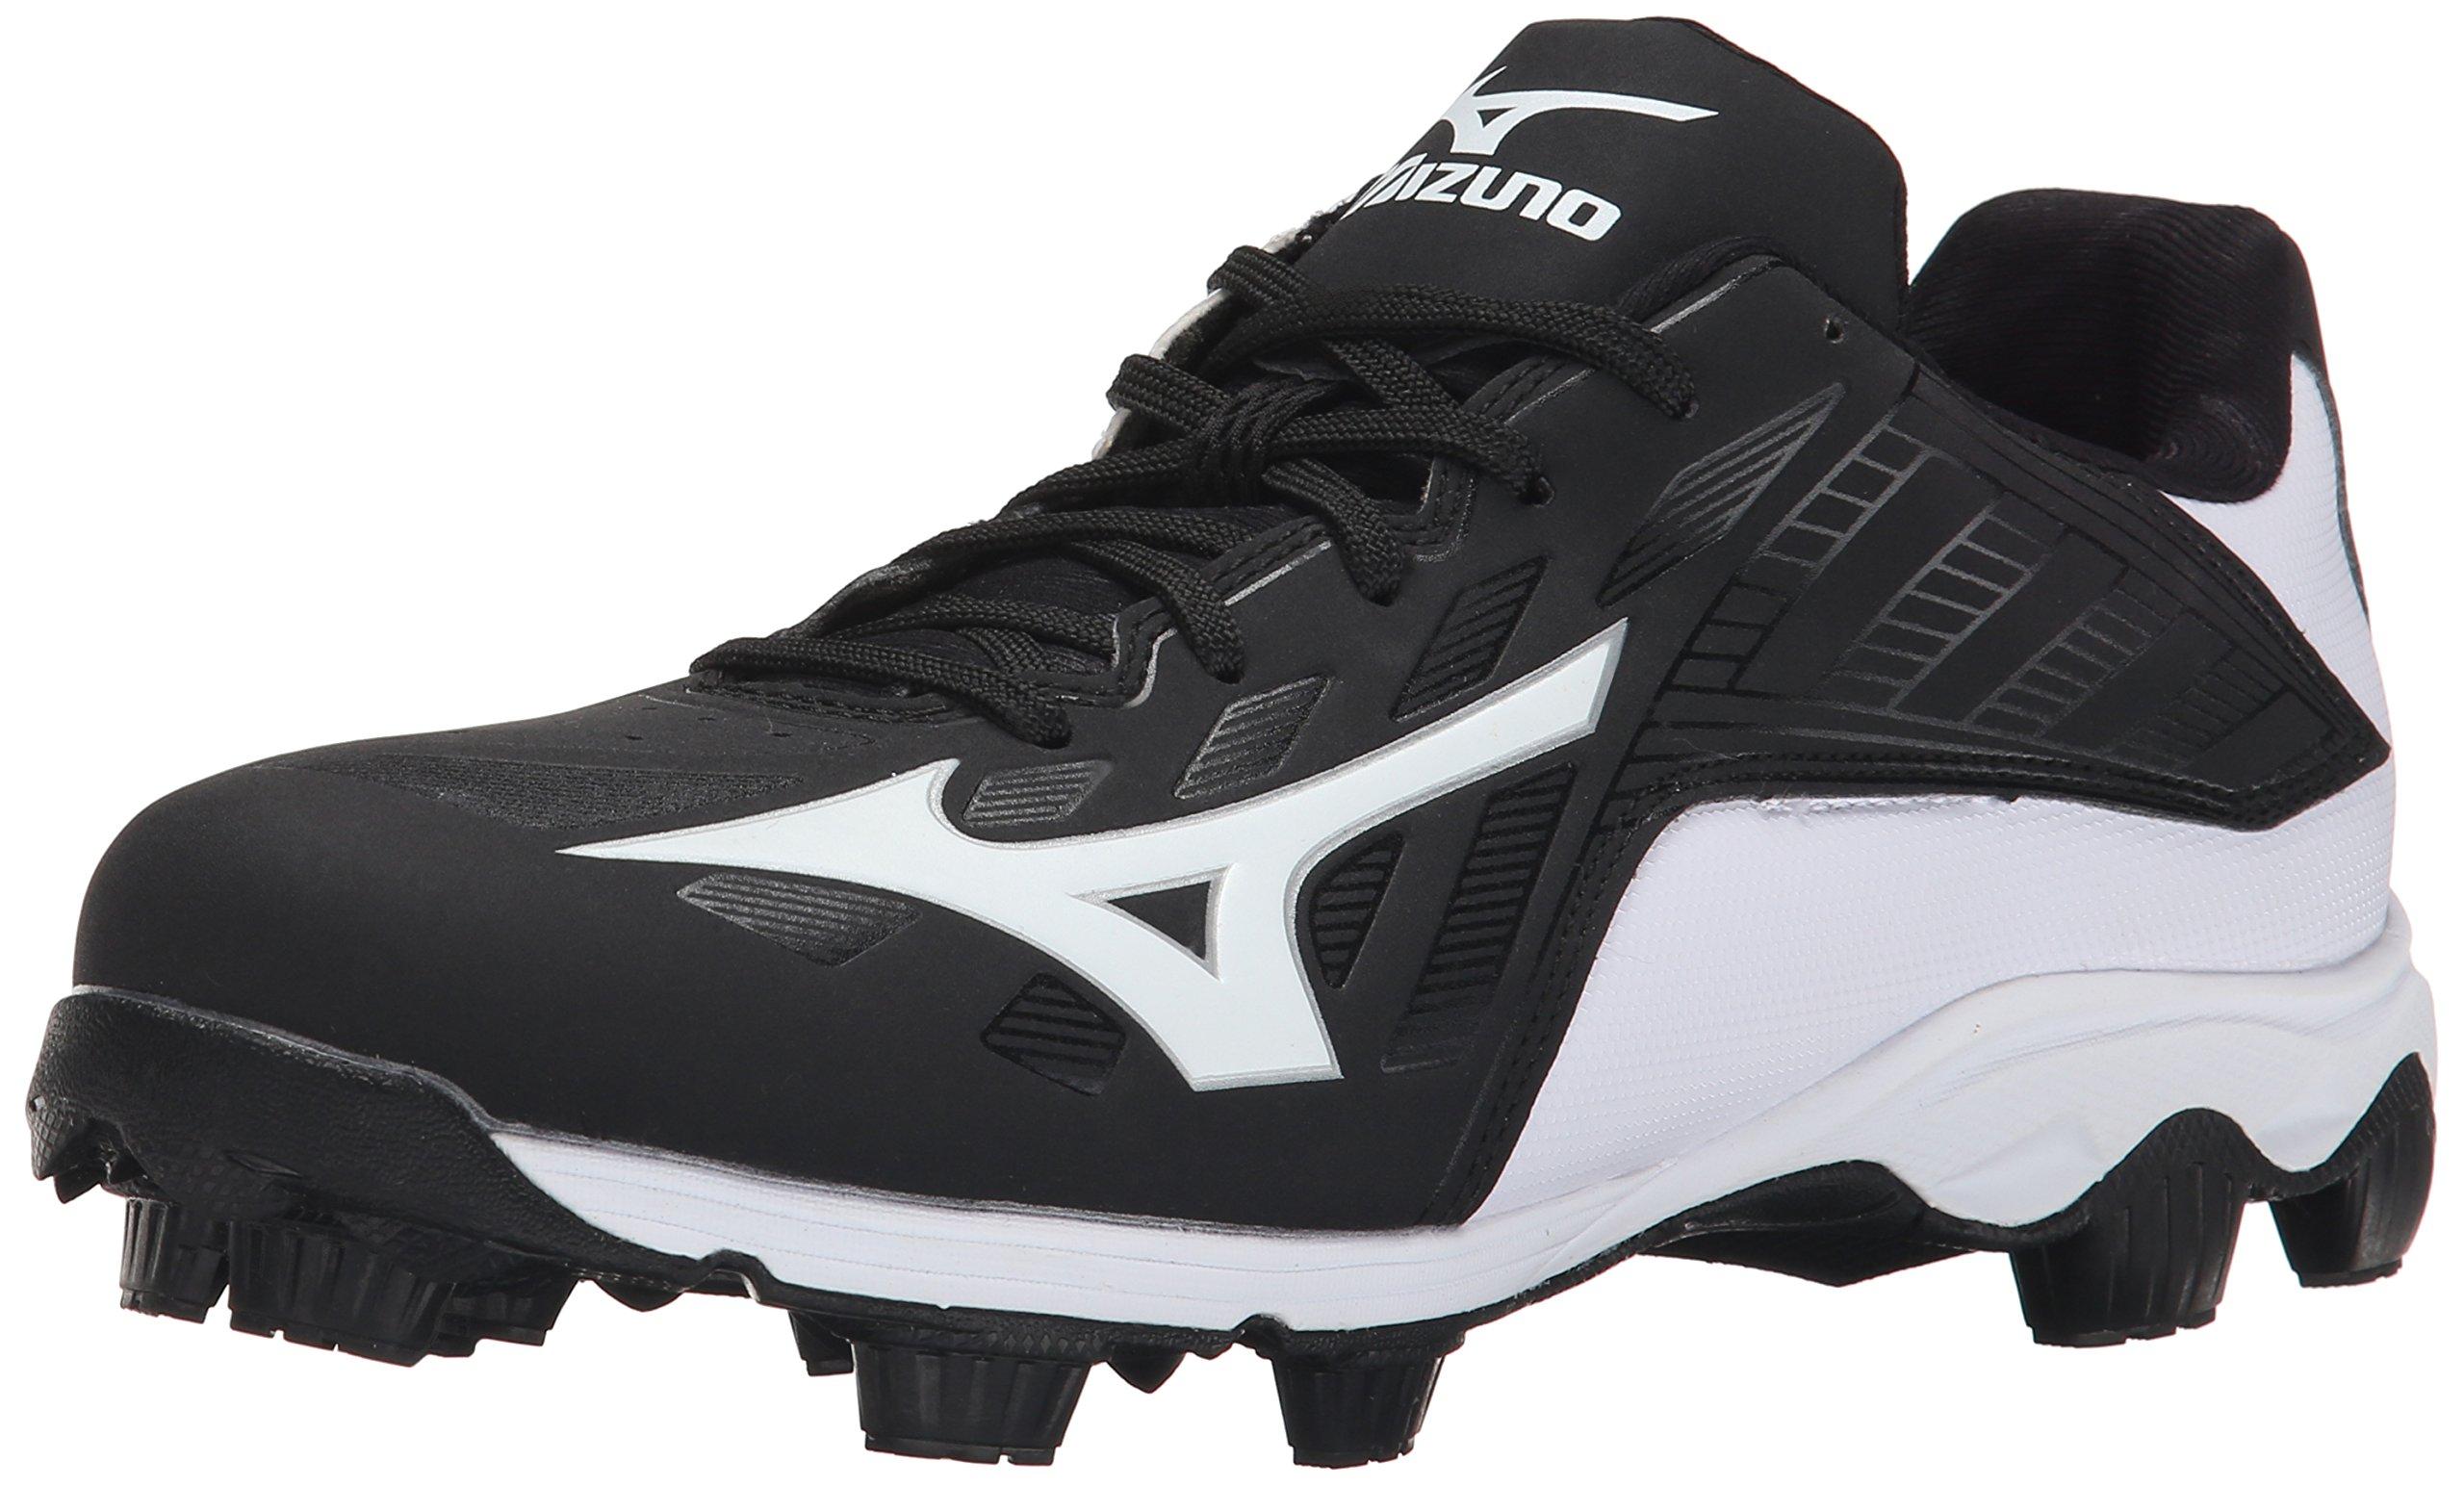 Mizuno Men's 9 Spike ADV Franchise 8 Baseball Cleat, Black/White, 9.5 M US